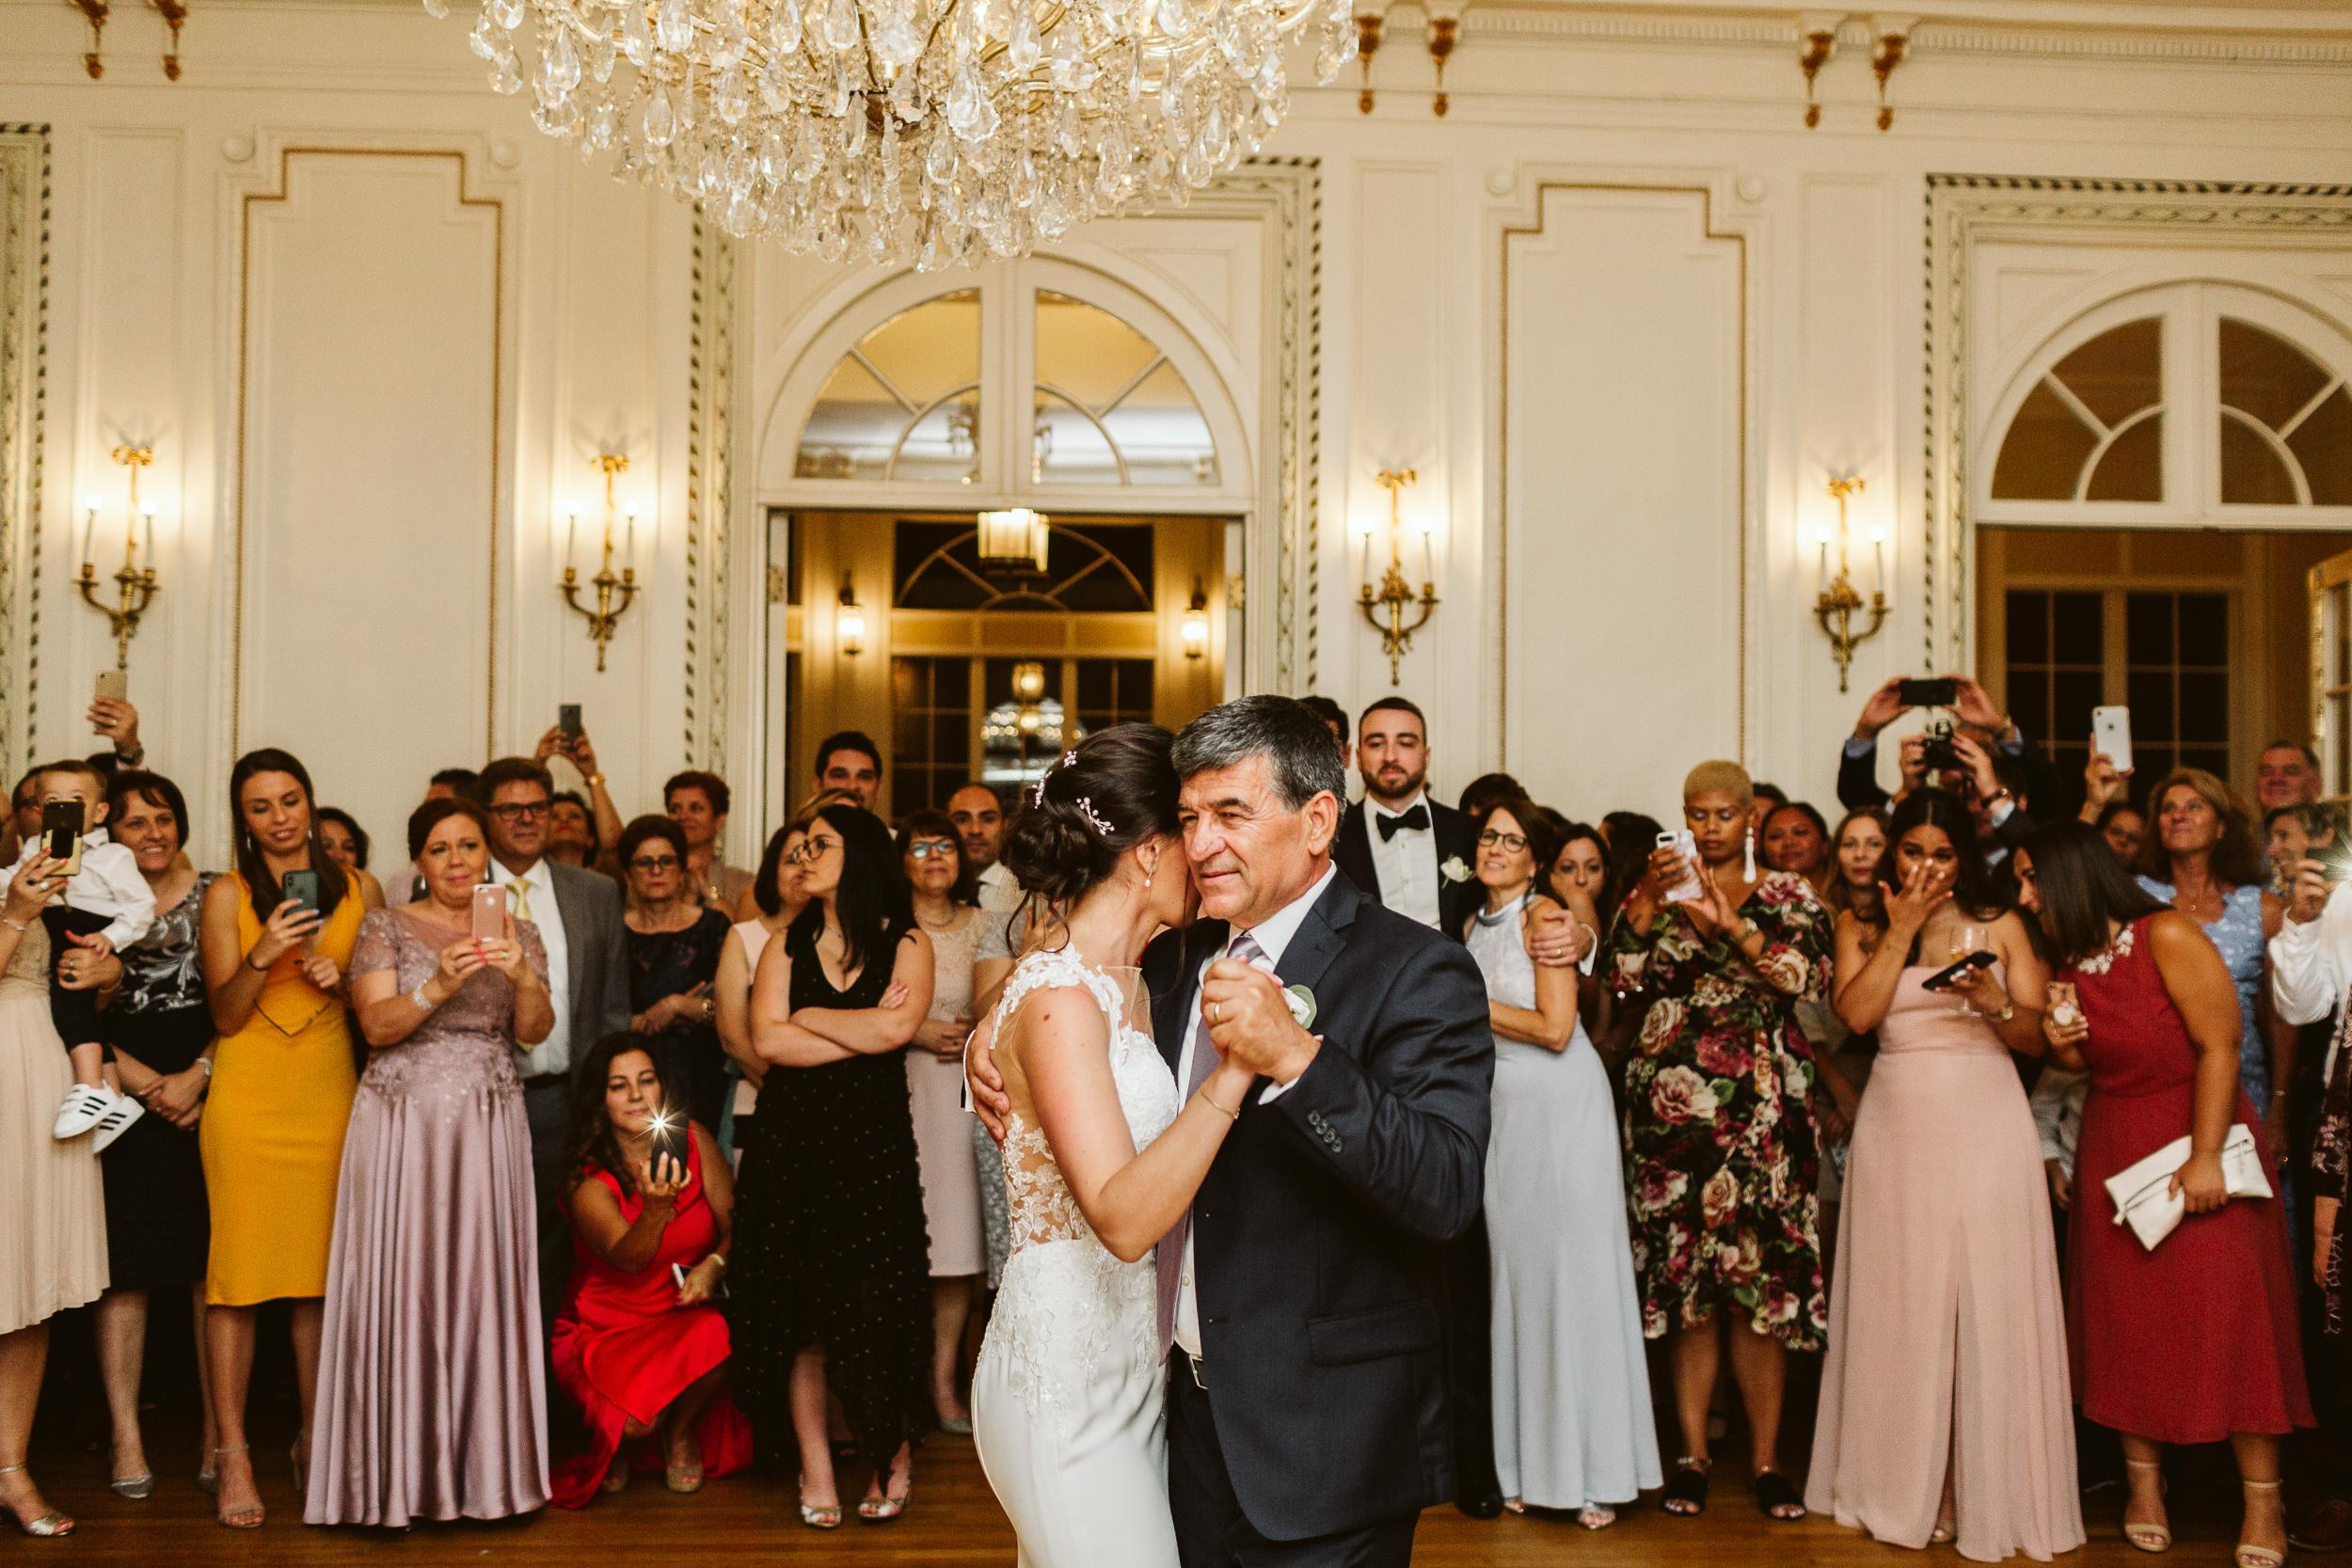 tupper-manor-wedding-photos-0031.JPG